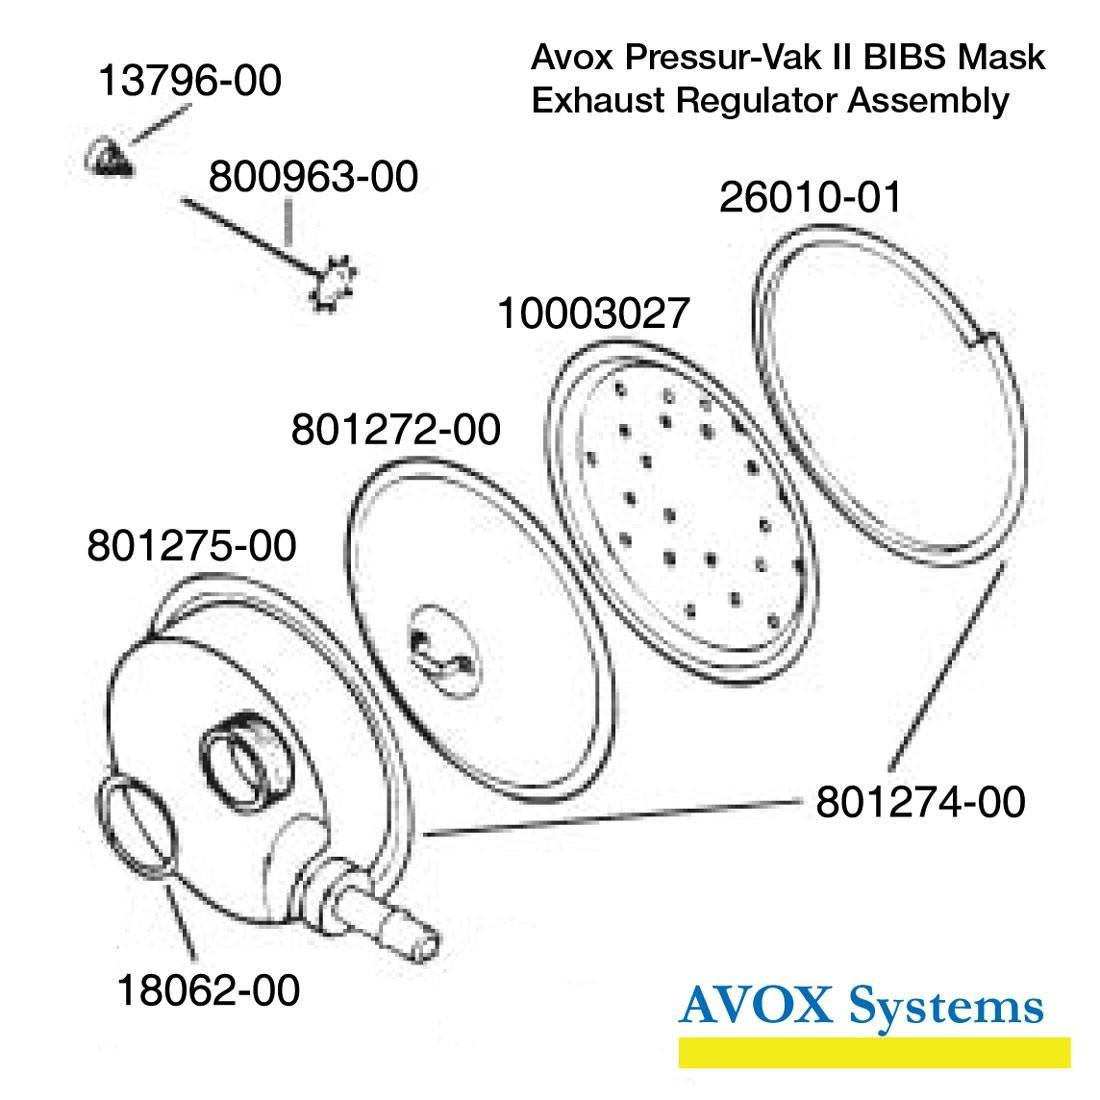 Pressur-Vak II Exhaust Regulator Assembly - Spares